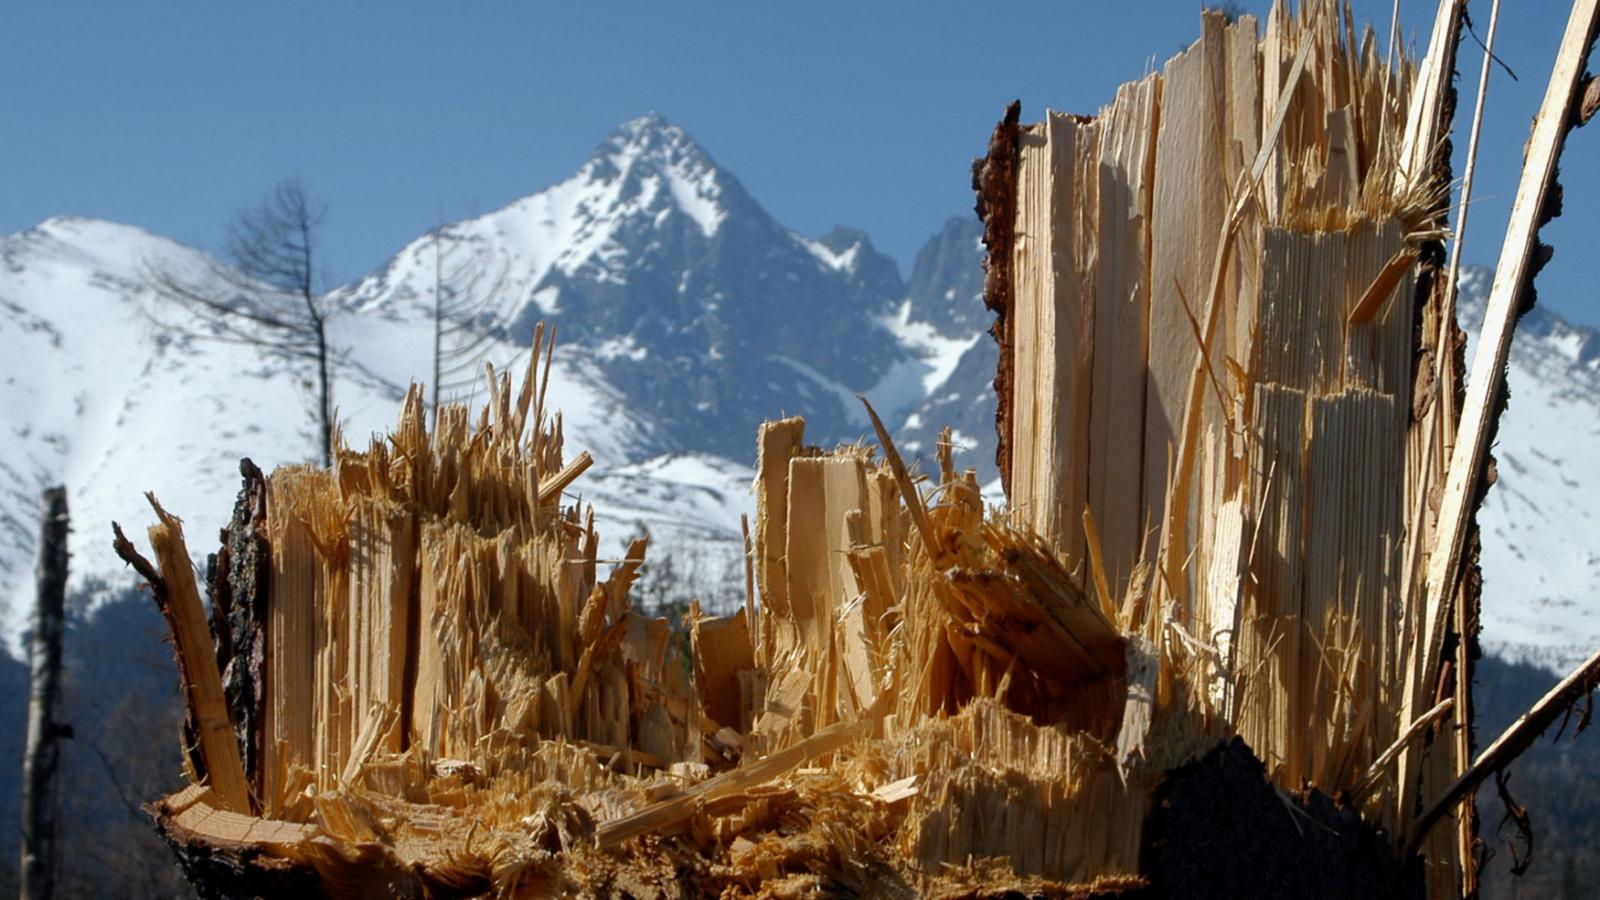 Tatry po ničivé vichřici v roce 2004